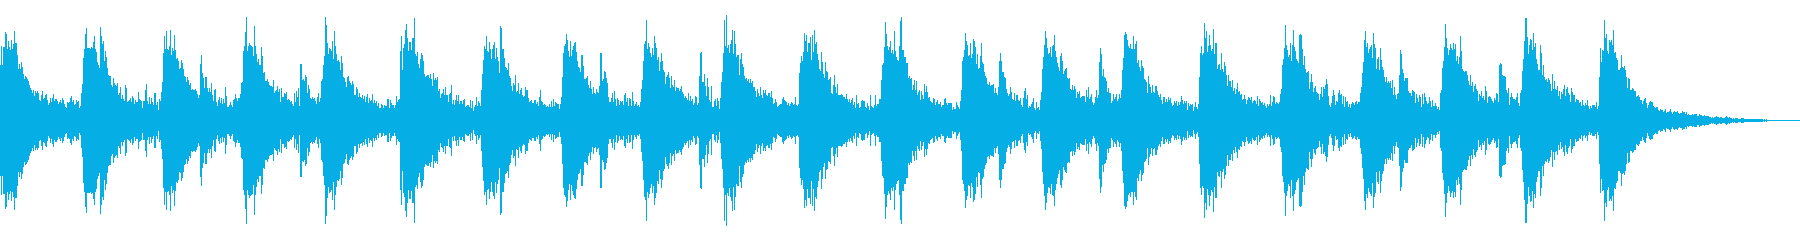 TikTok ホラー!の再生済みの波形